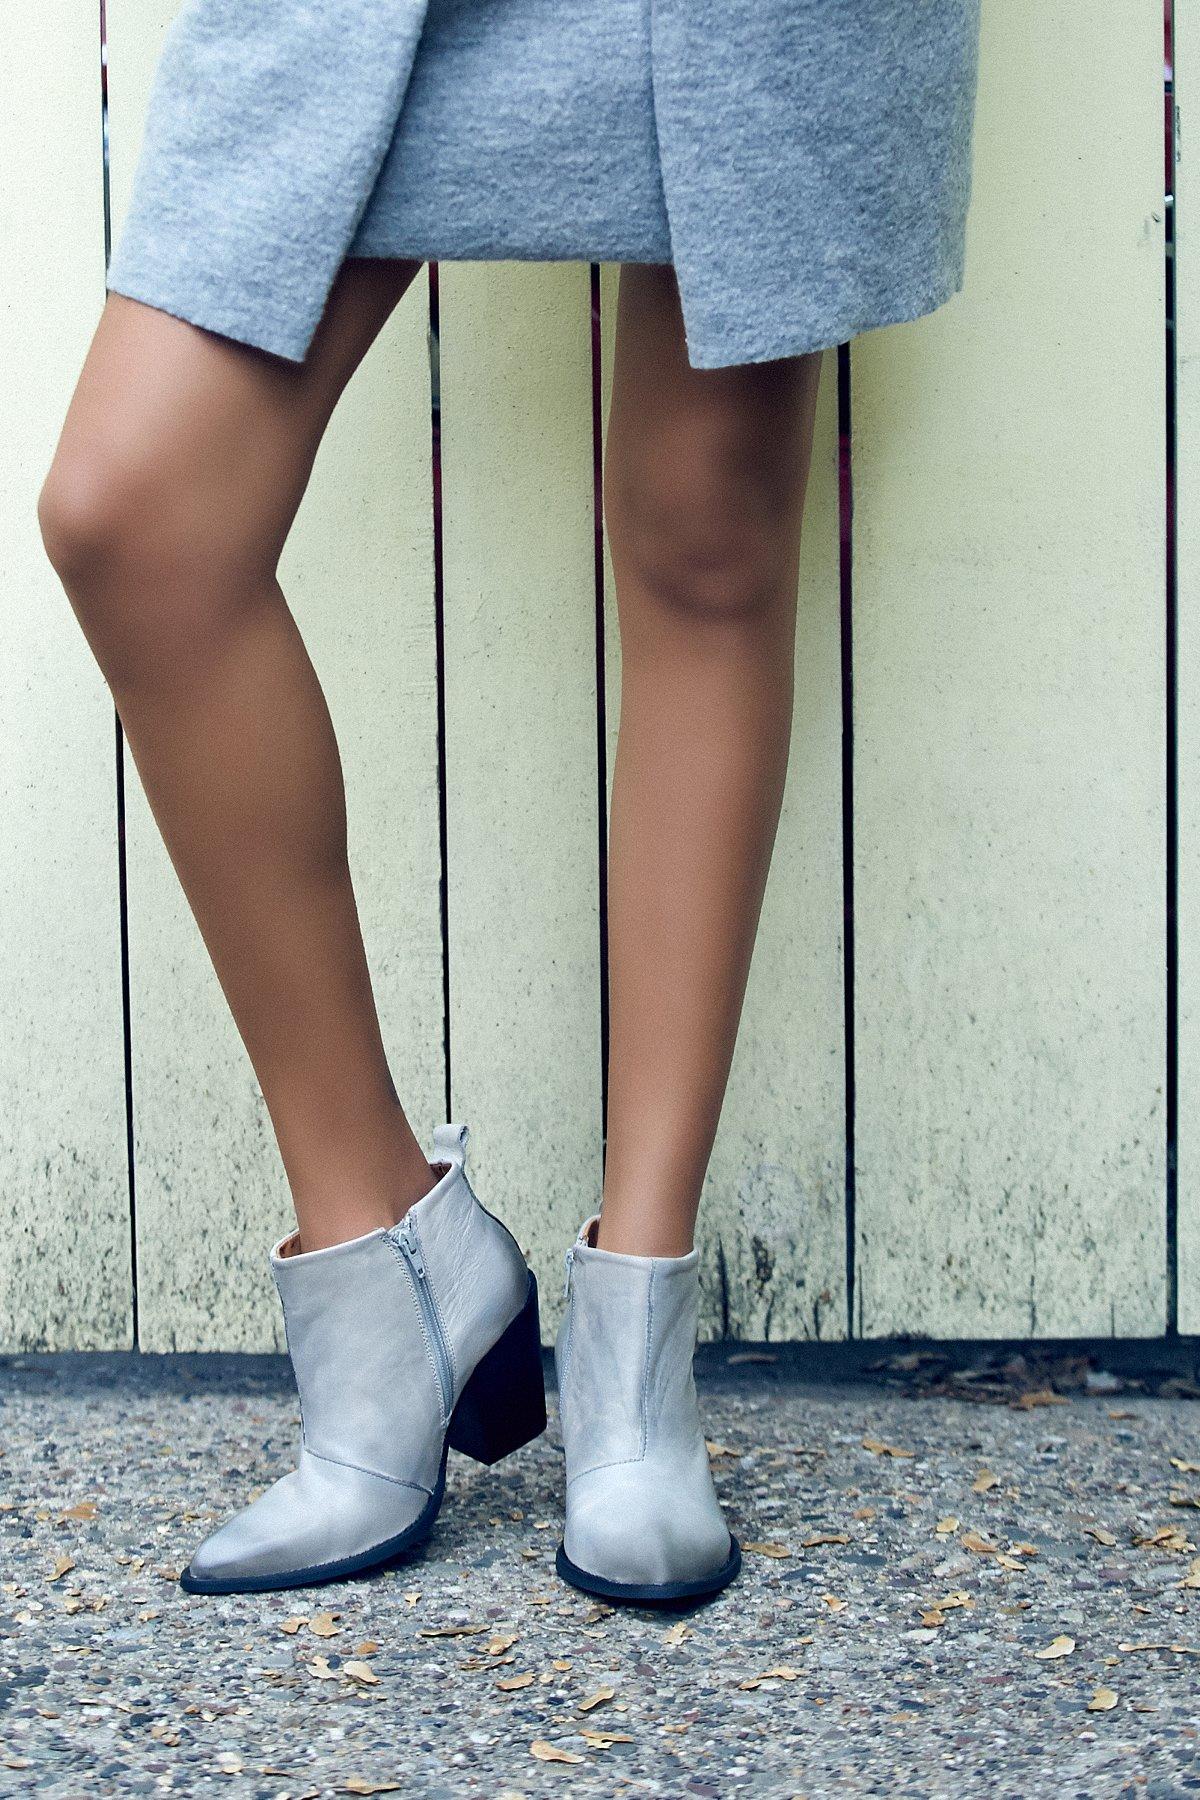 Entrance踝靴